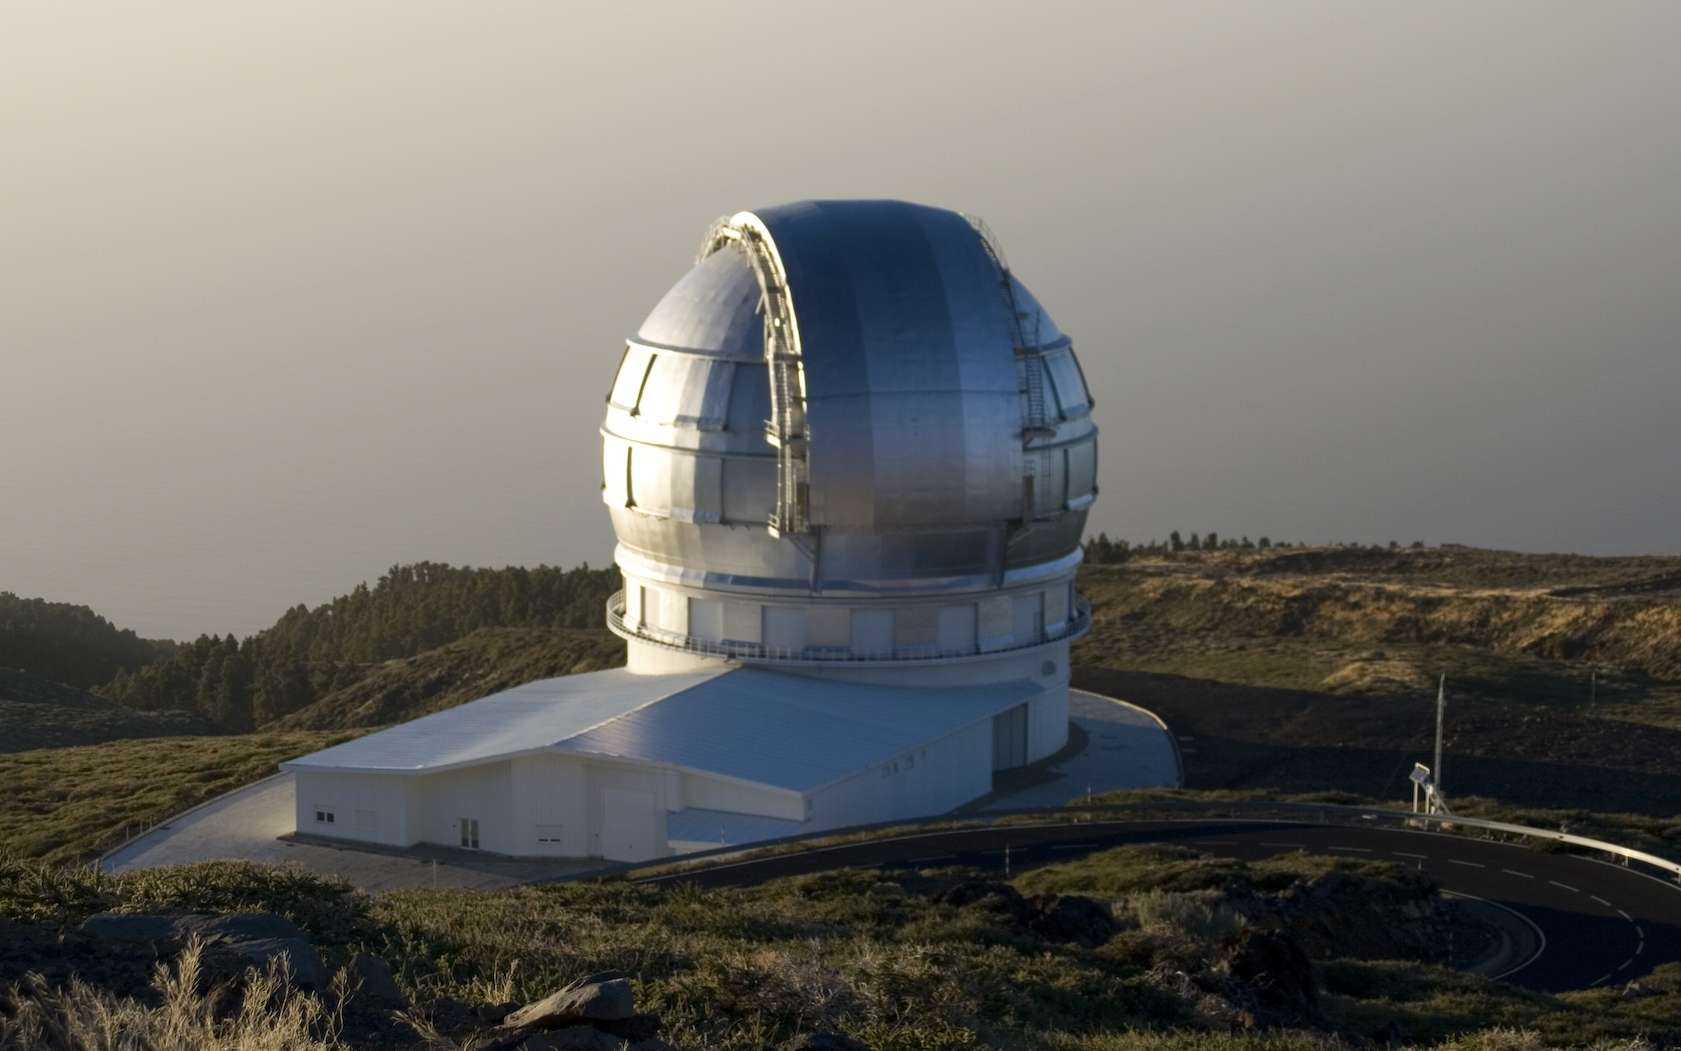 La coupole abritant le Grand télescope des Canaries. © Wikimedia, Creative Commons asa 3.0